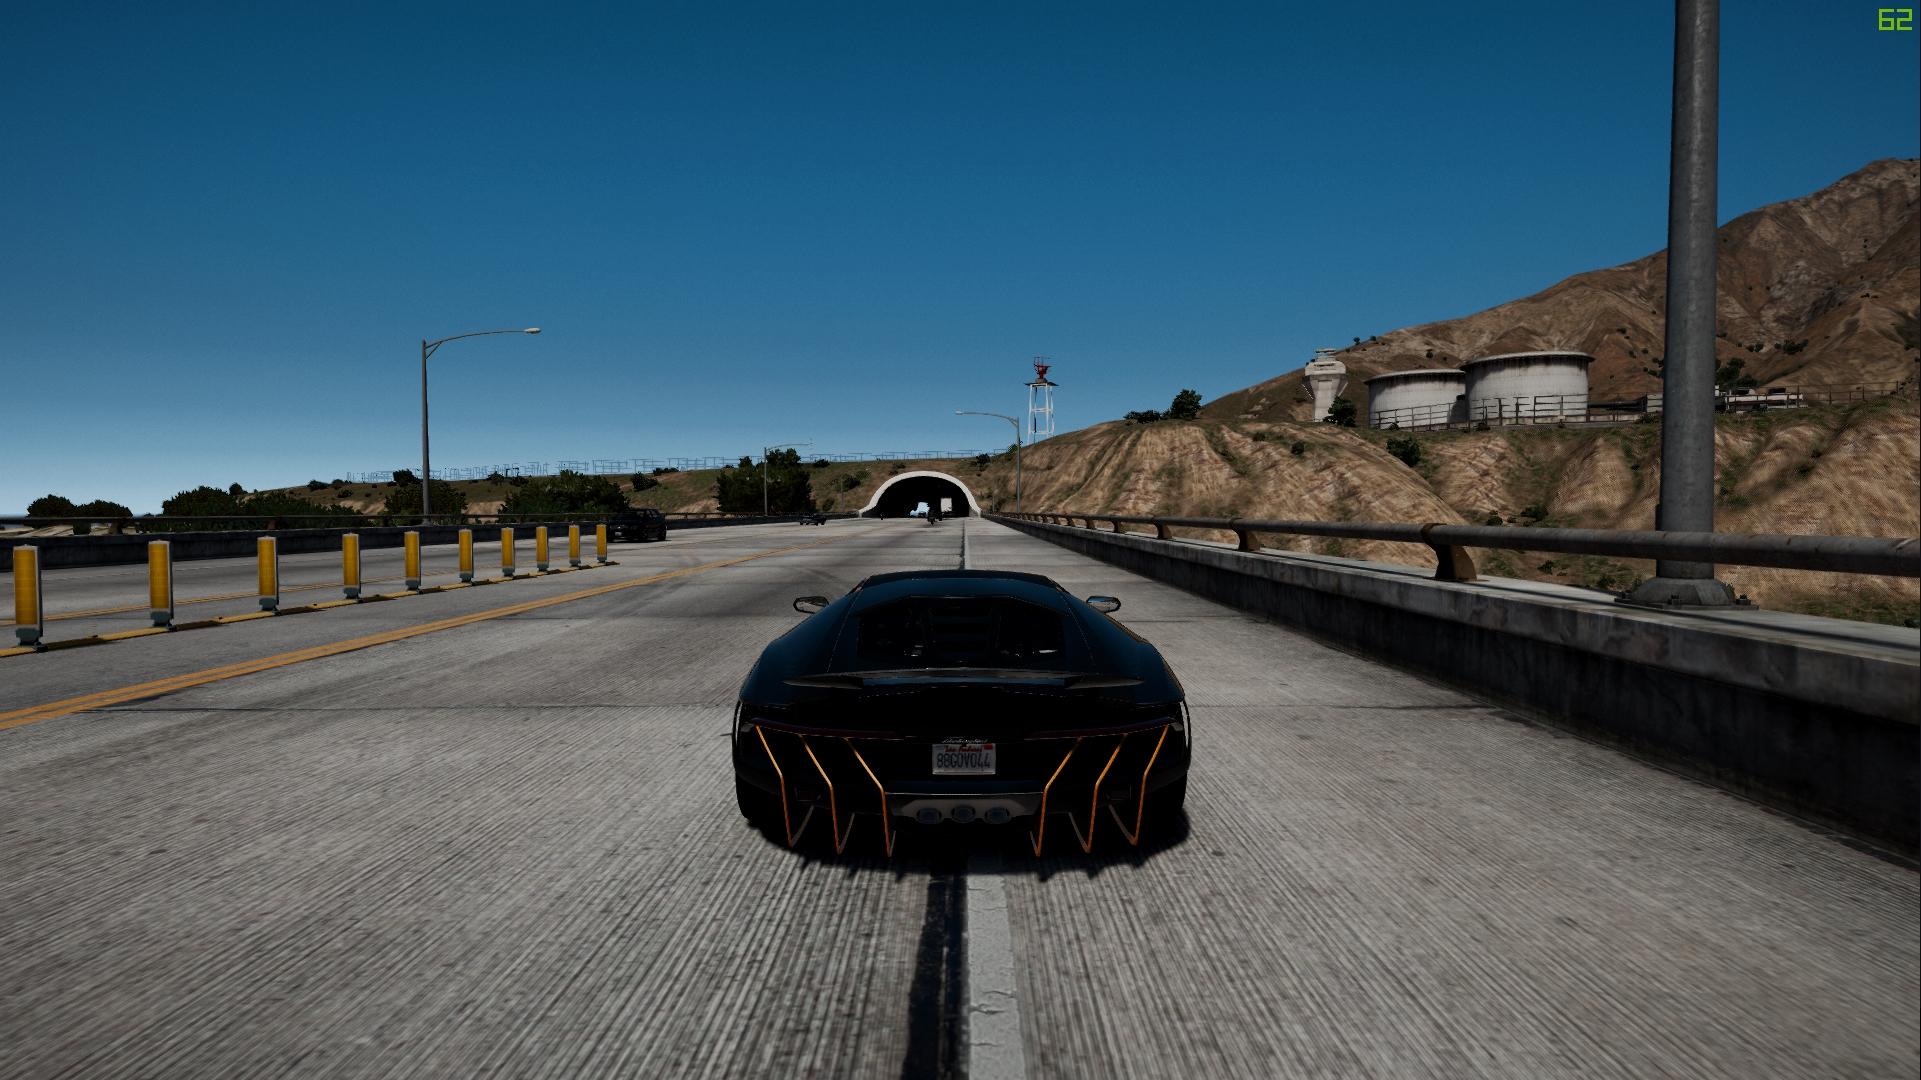 GTA5最強のグラフィックMOD「Natural Vision」が究極進化